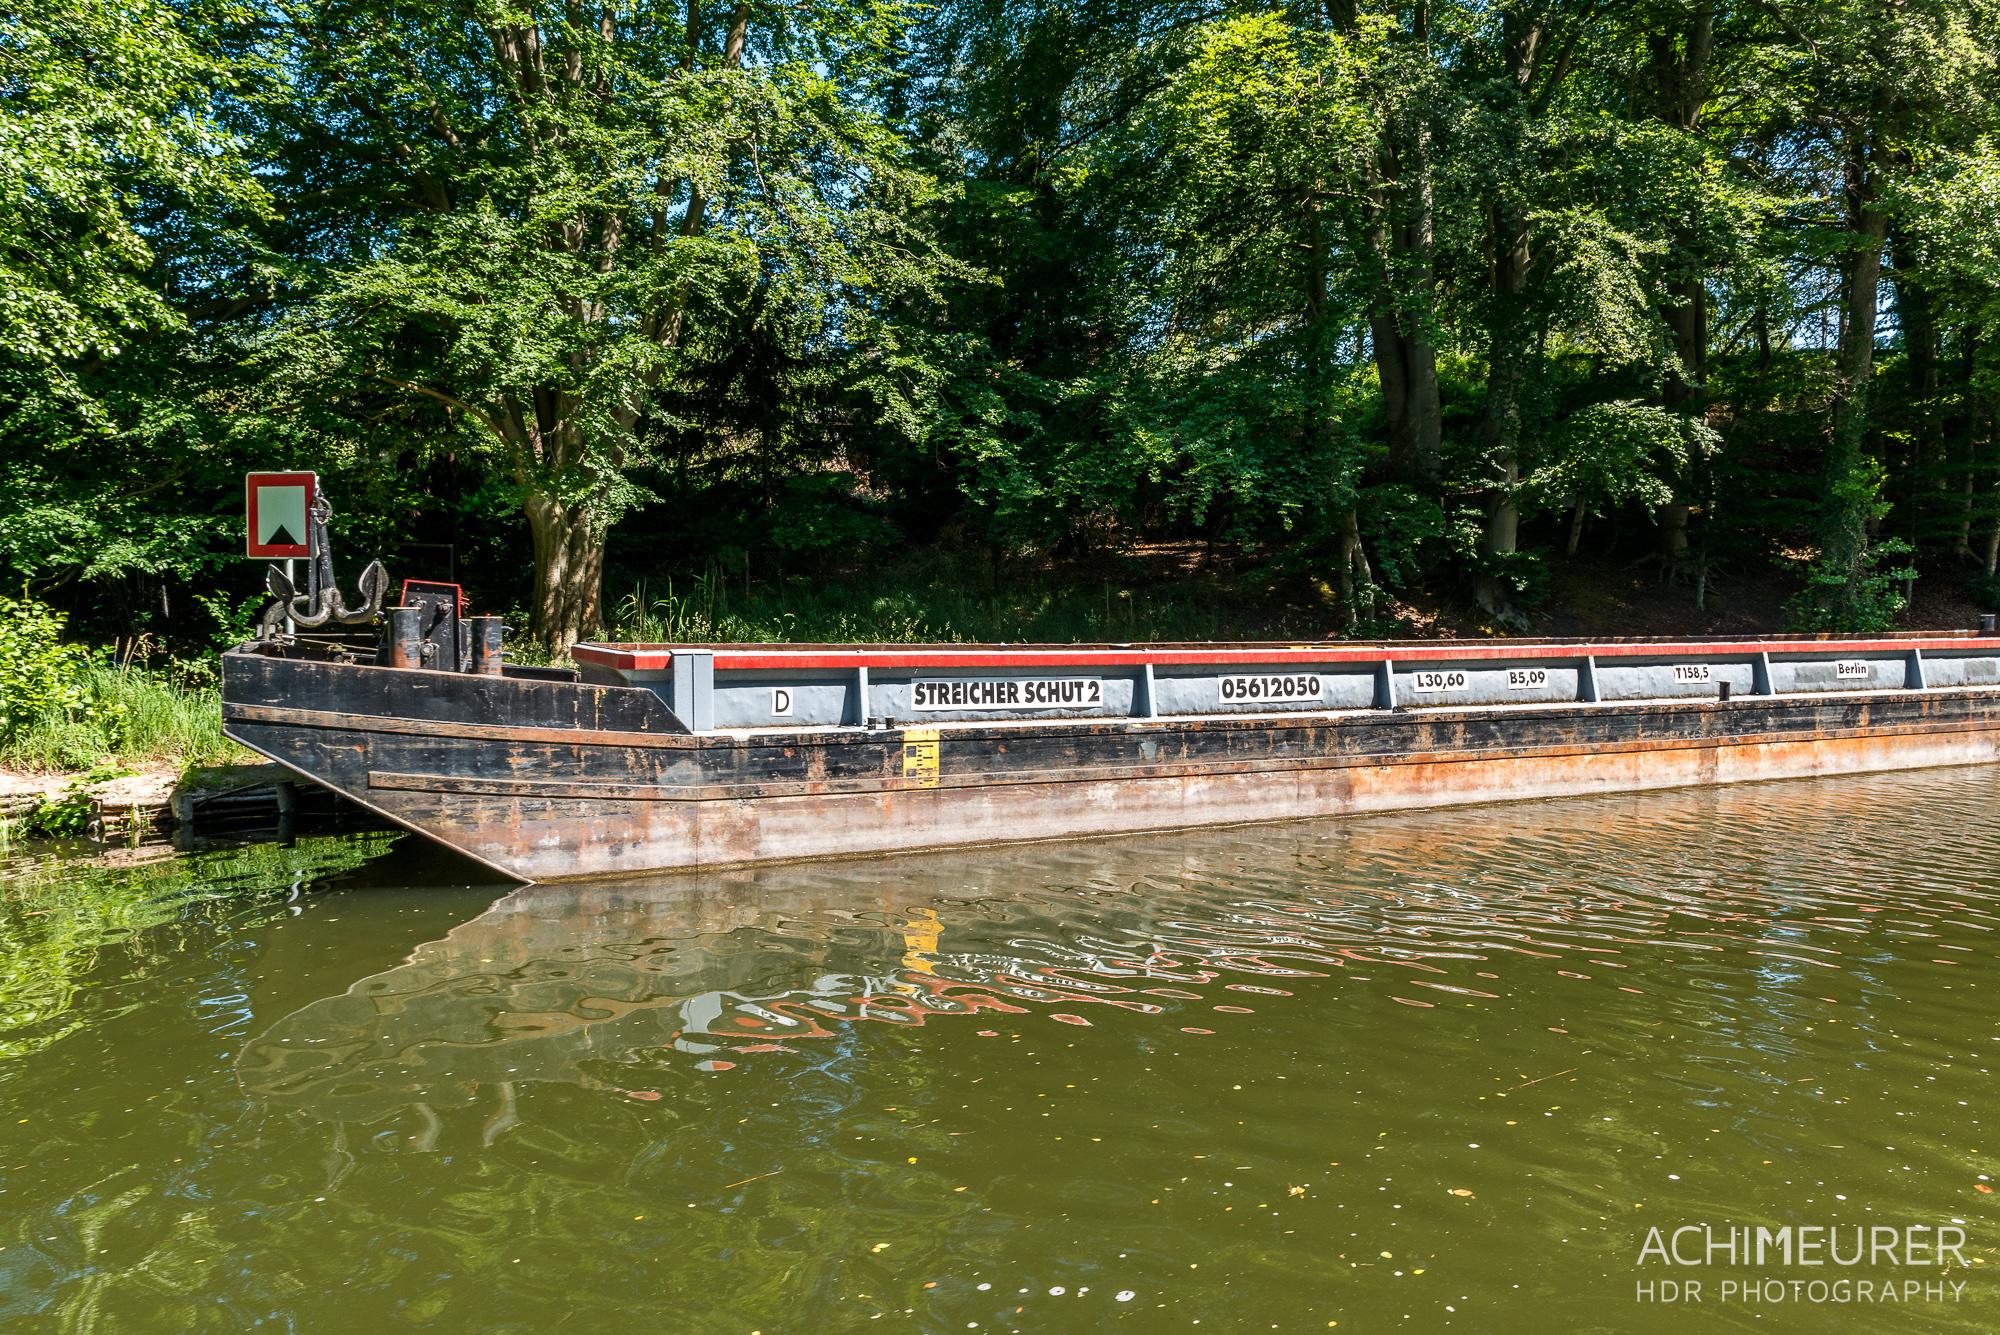 Hausboot-Kuhnle-Mueritz-Mecklenburg-Vorpommern-See_3142